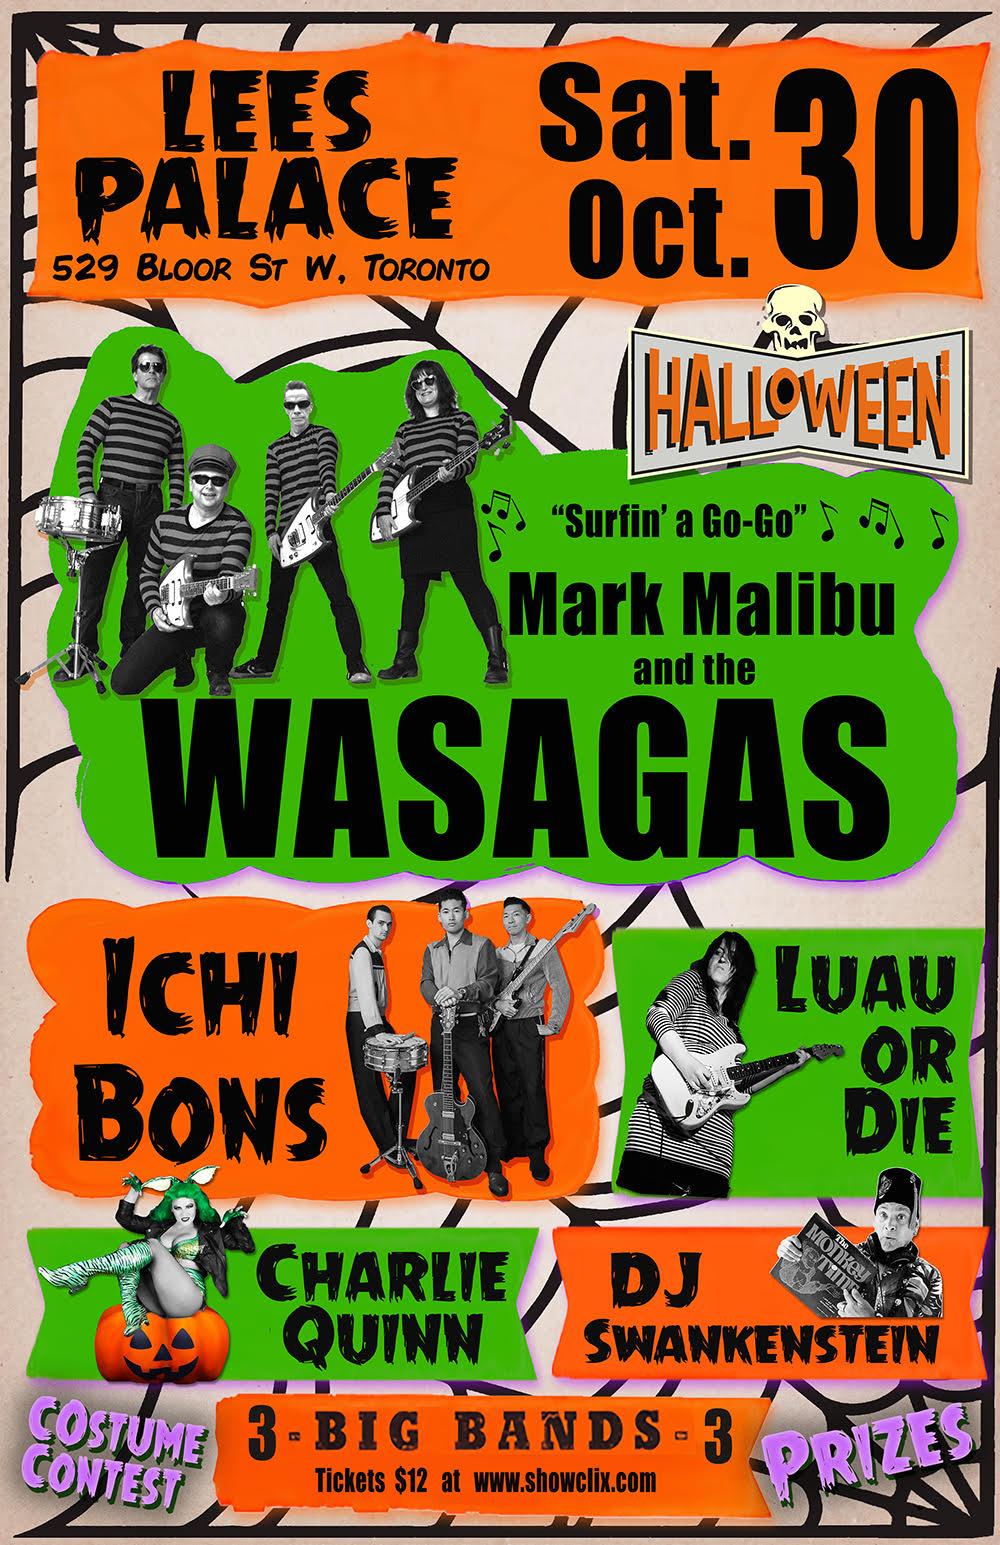 Mark Malibu and the Wasagas